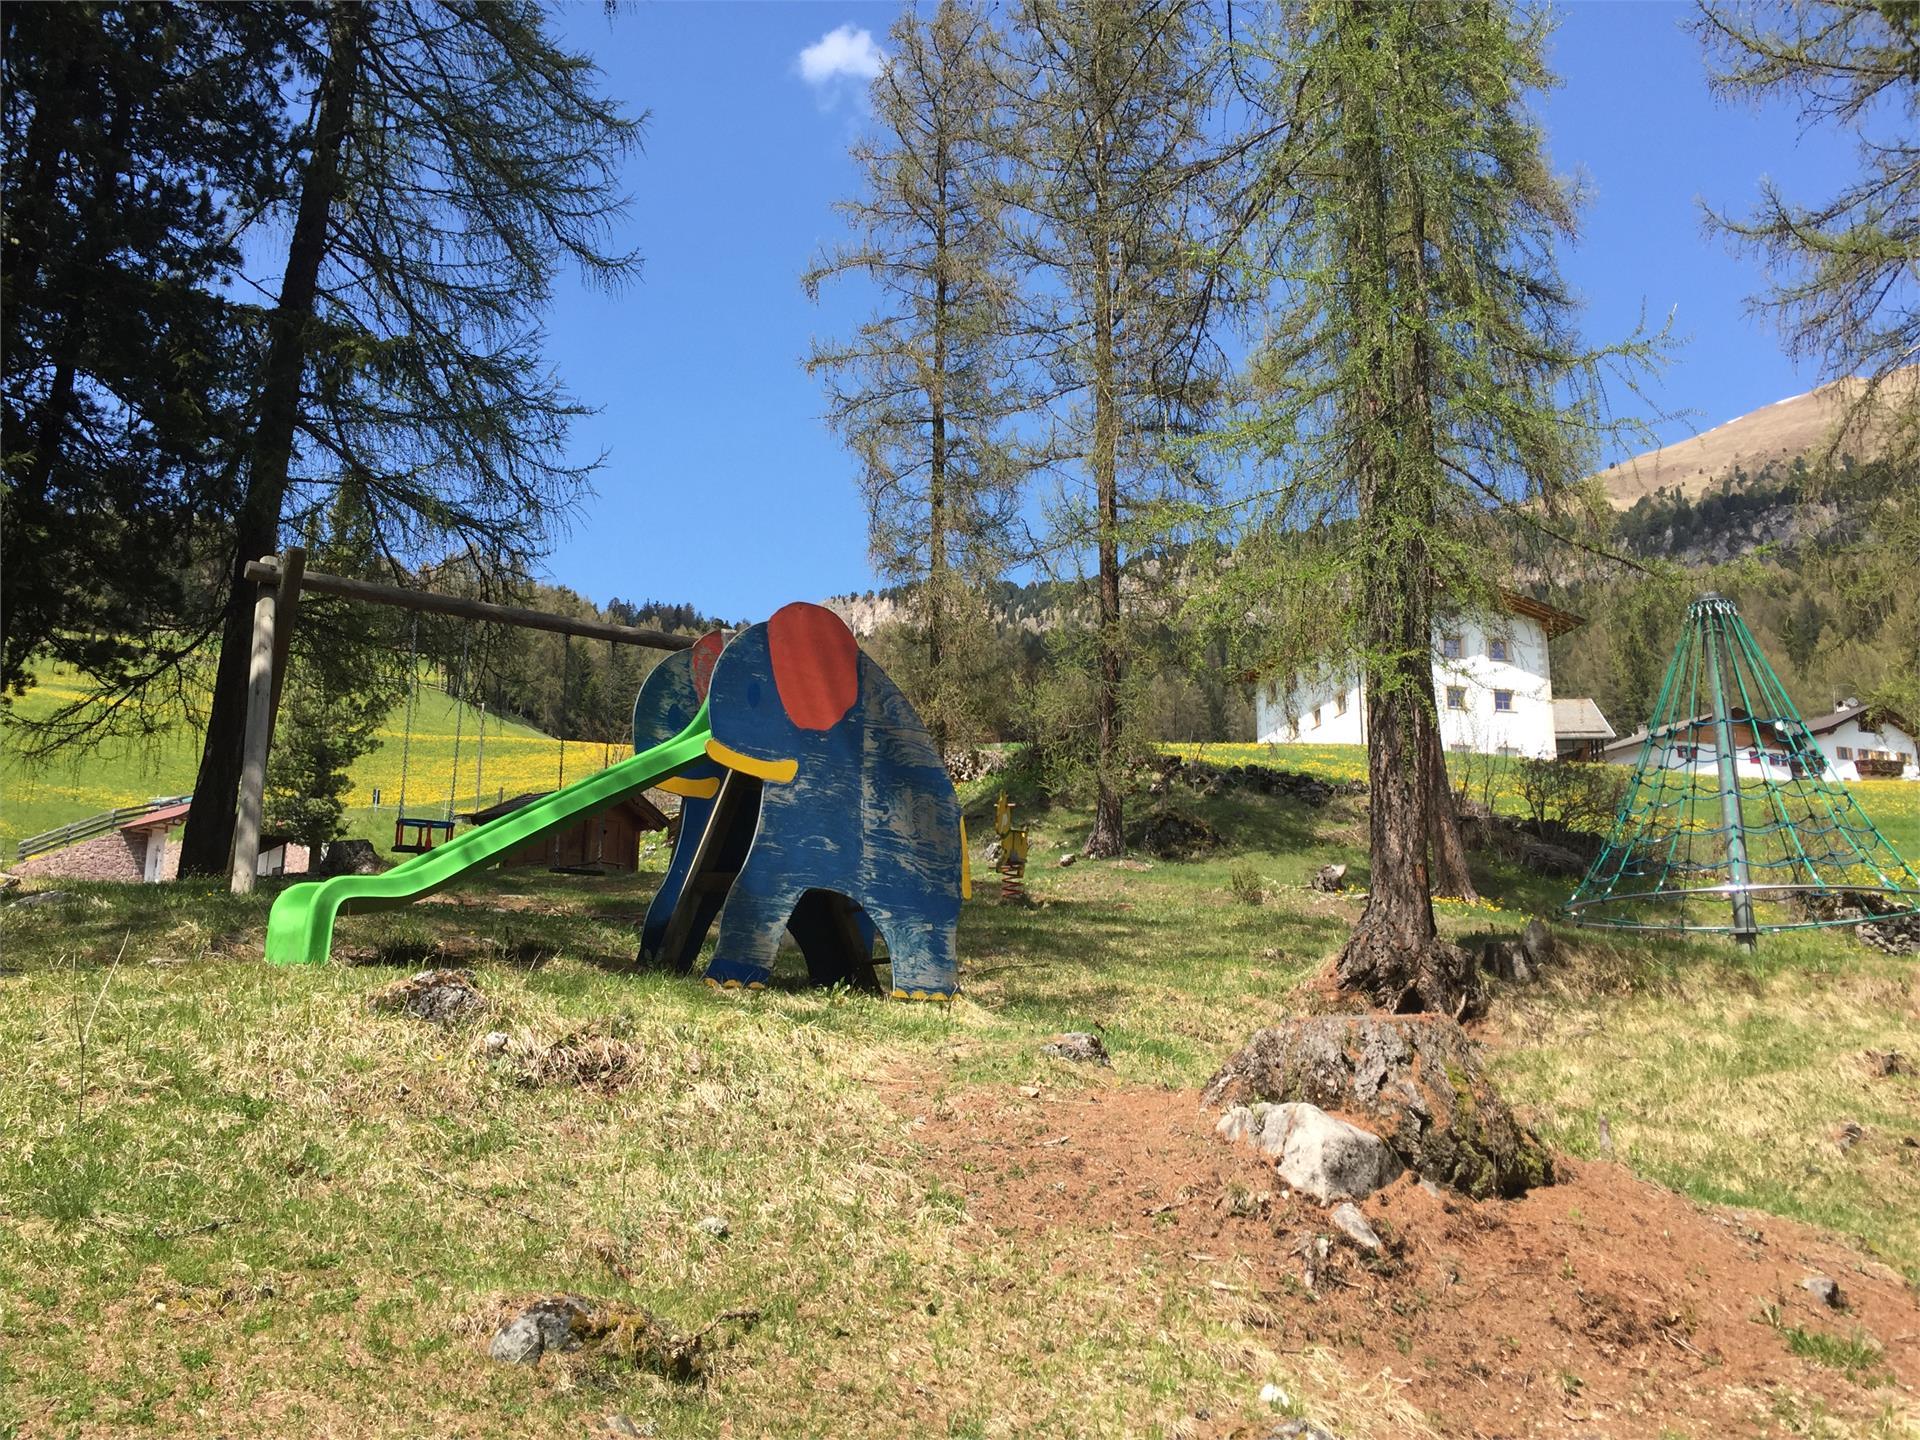 Children's playground Plesdinaz Praulëta